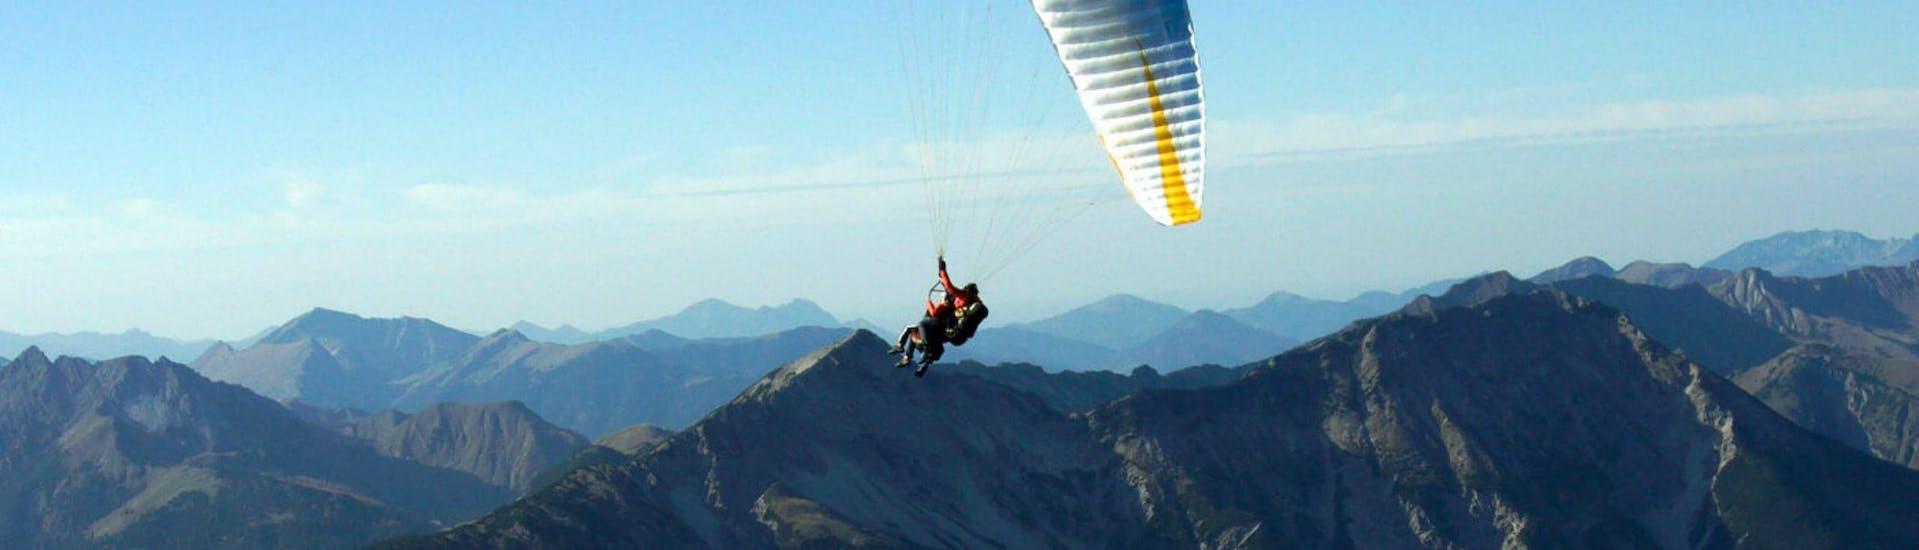 tandem-paragliding-panorama-tandem-achensee-hero